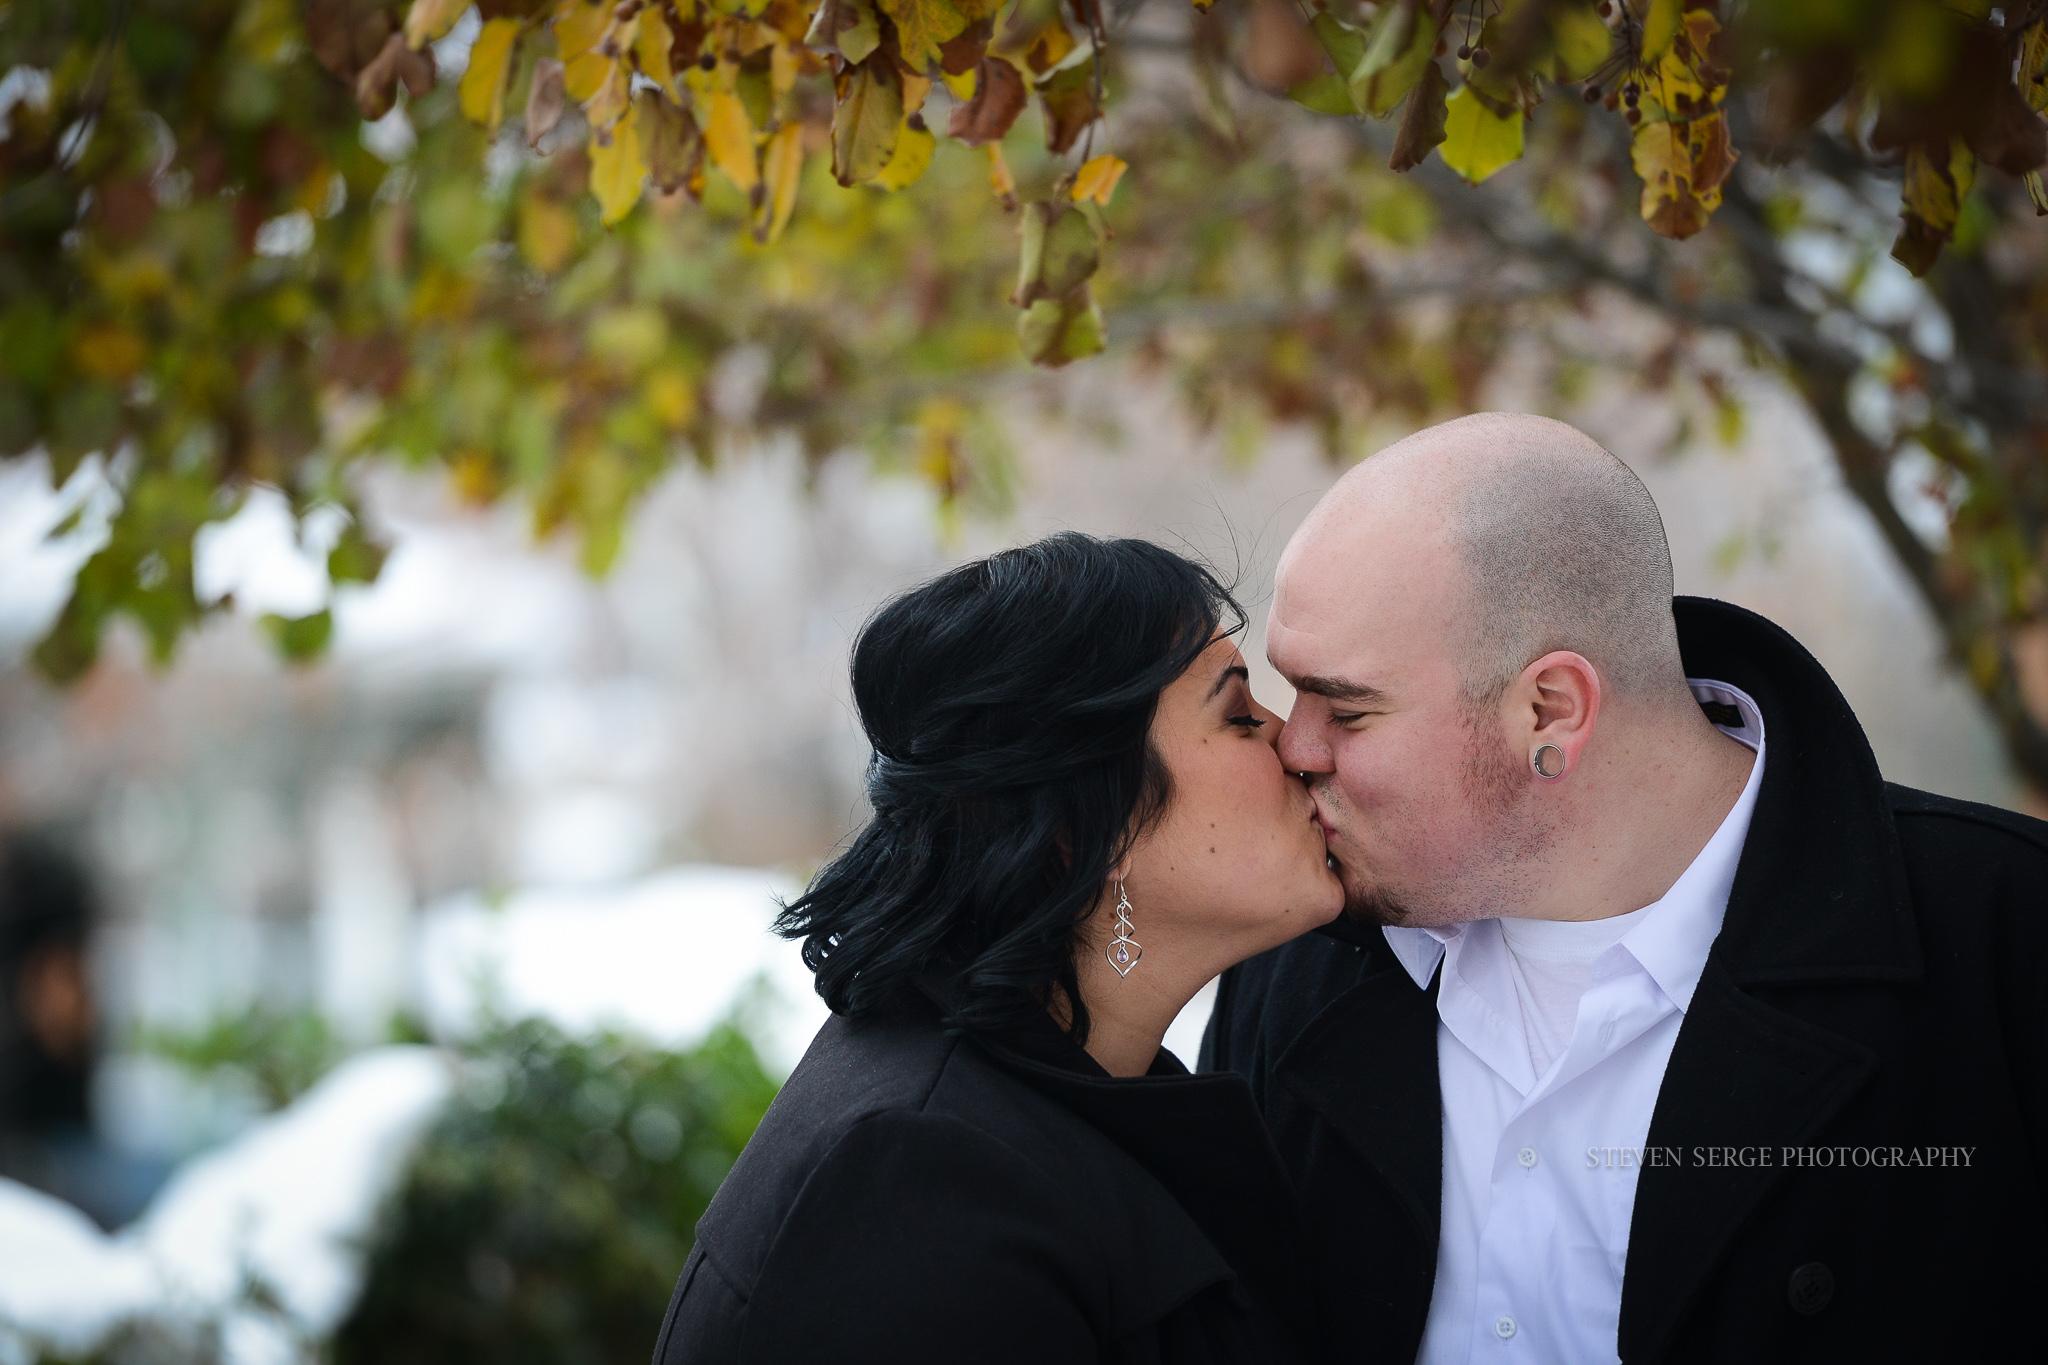 Rosa-NEPA-Wedding-Engagement-Photographer-Waverly-Clarks-Summit-Scranton-Photographer-15.jpg